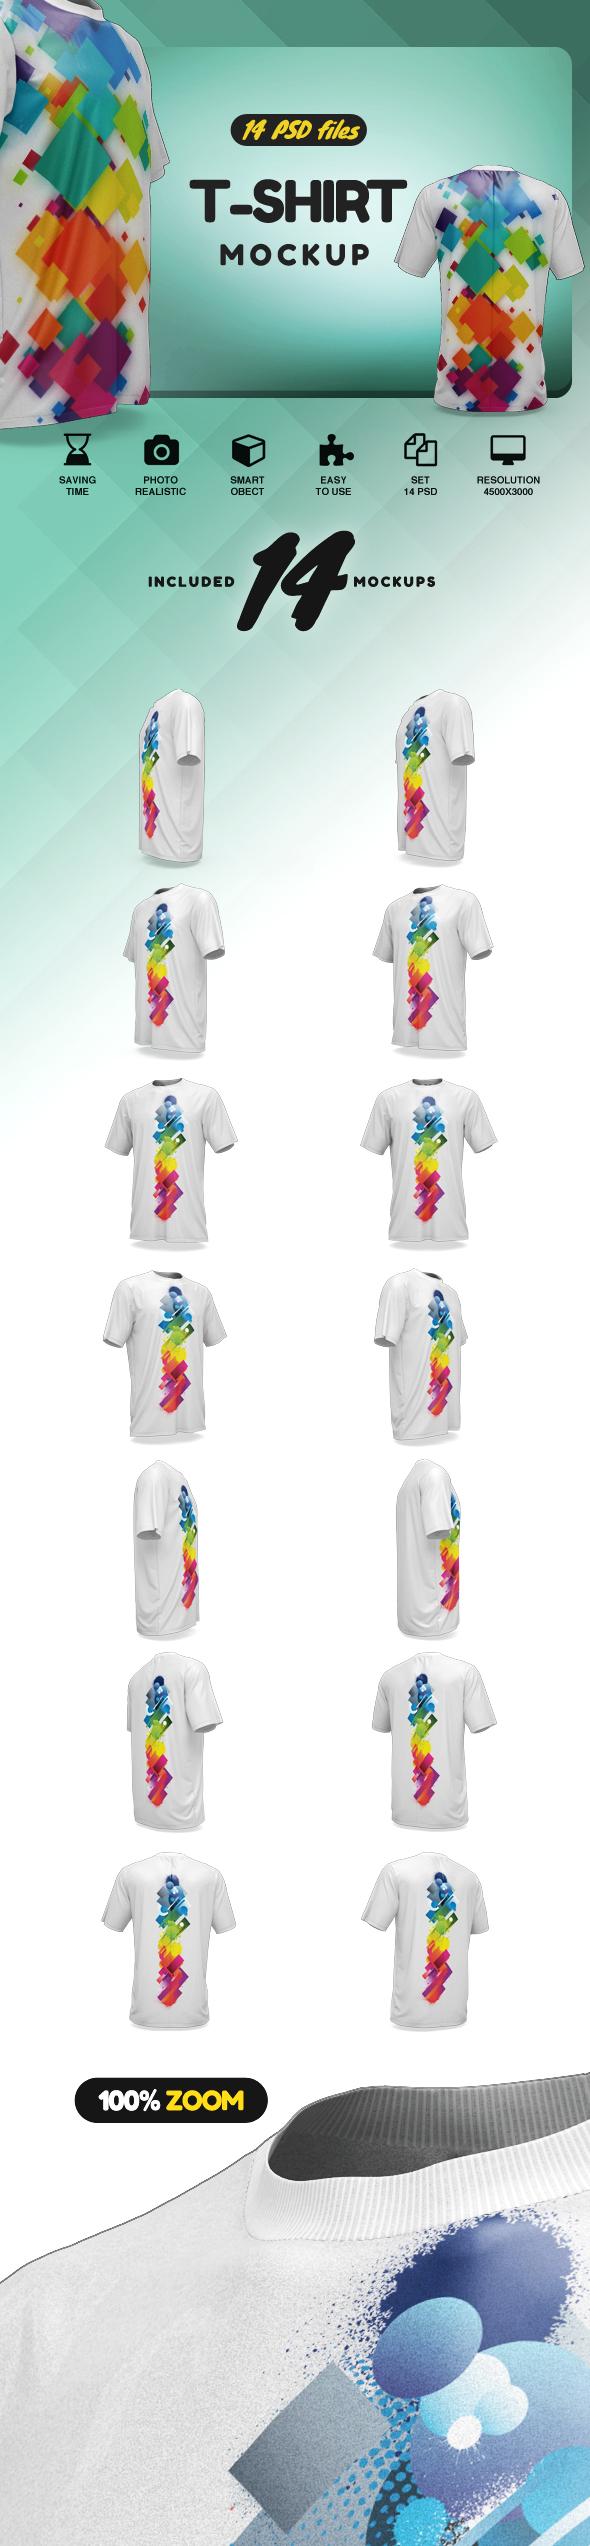 T-Shirt Mockup example image 2